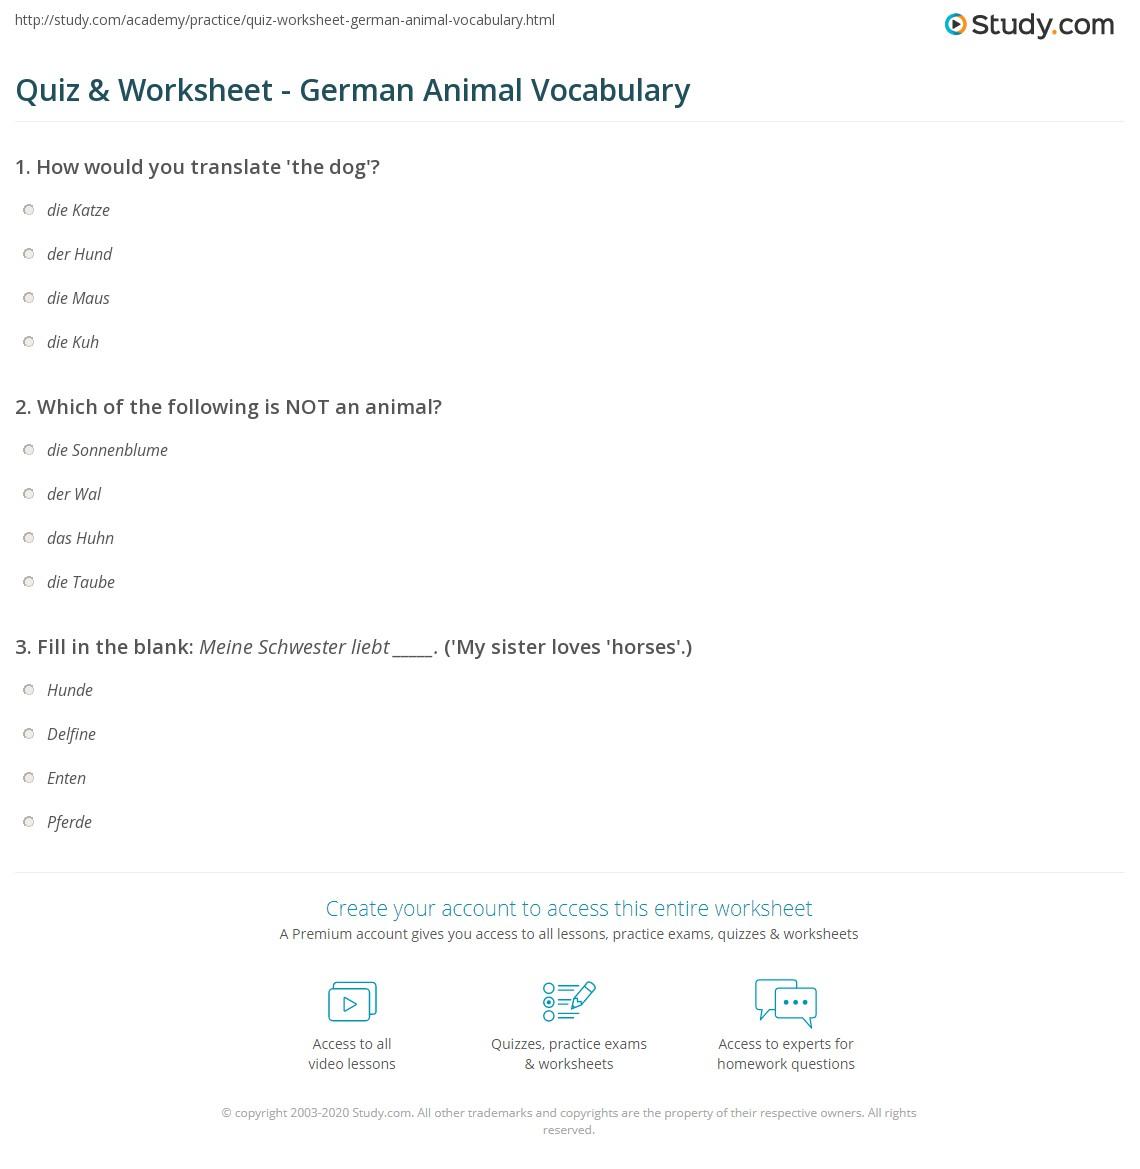 Quiz & Worksheet - German Animal Vocabulary | Study com